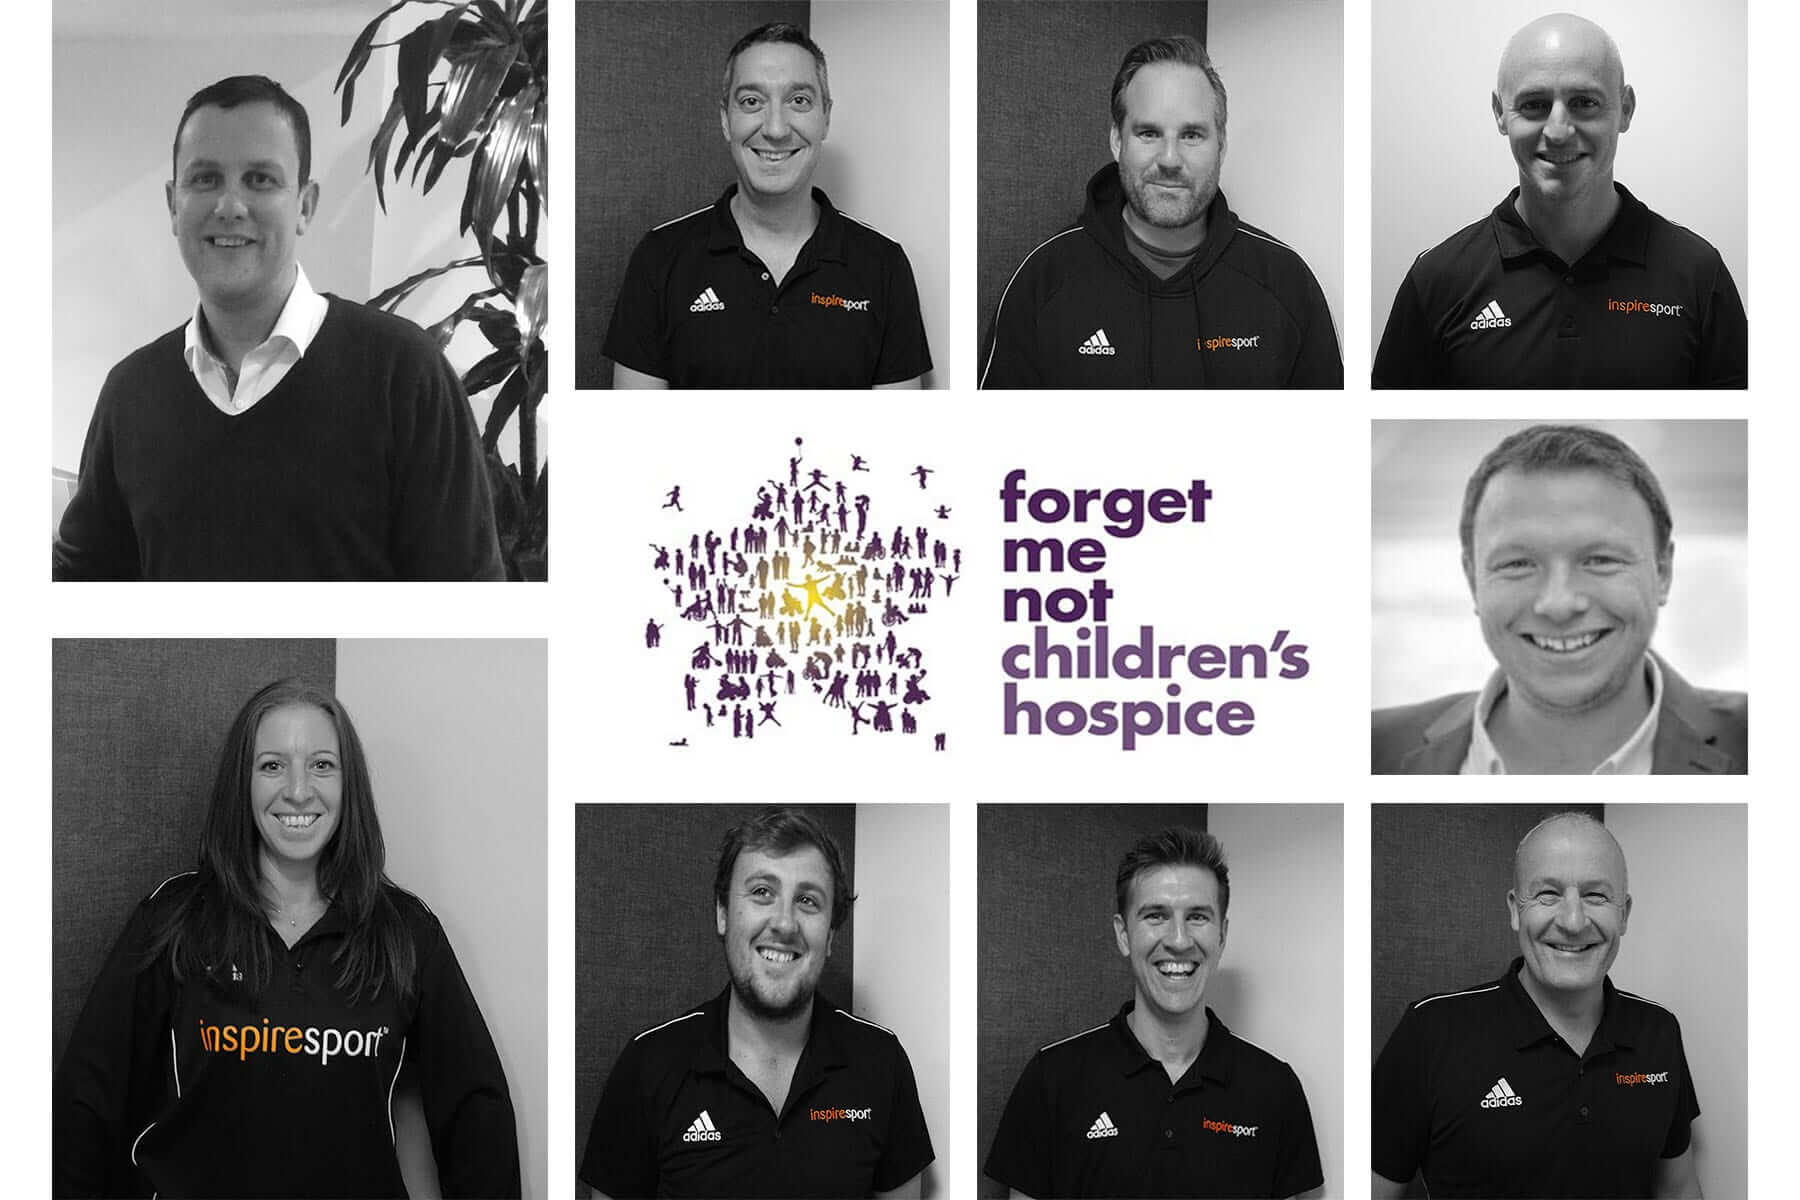 inspiresport charity team